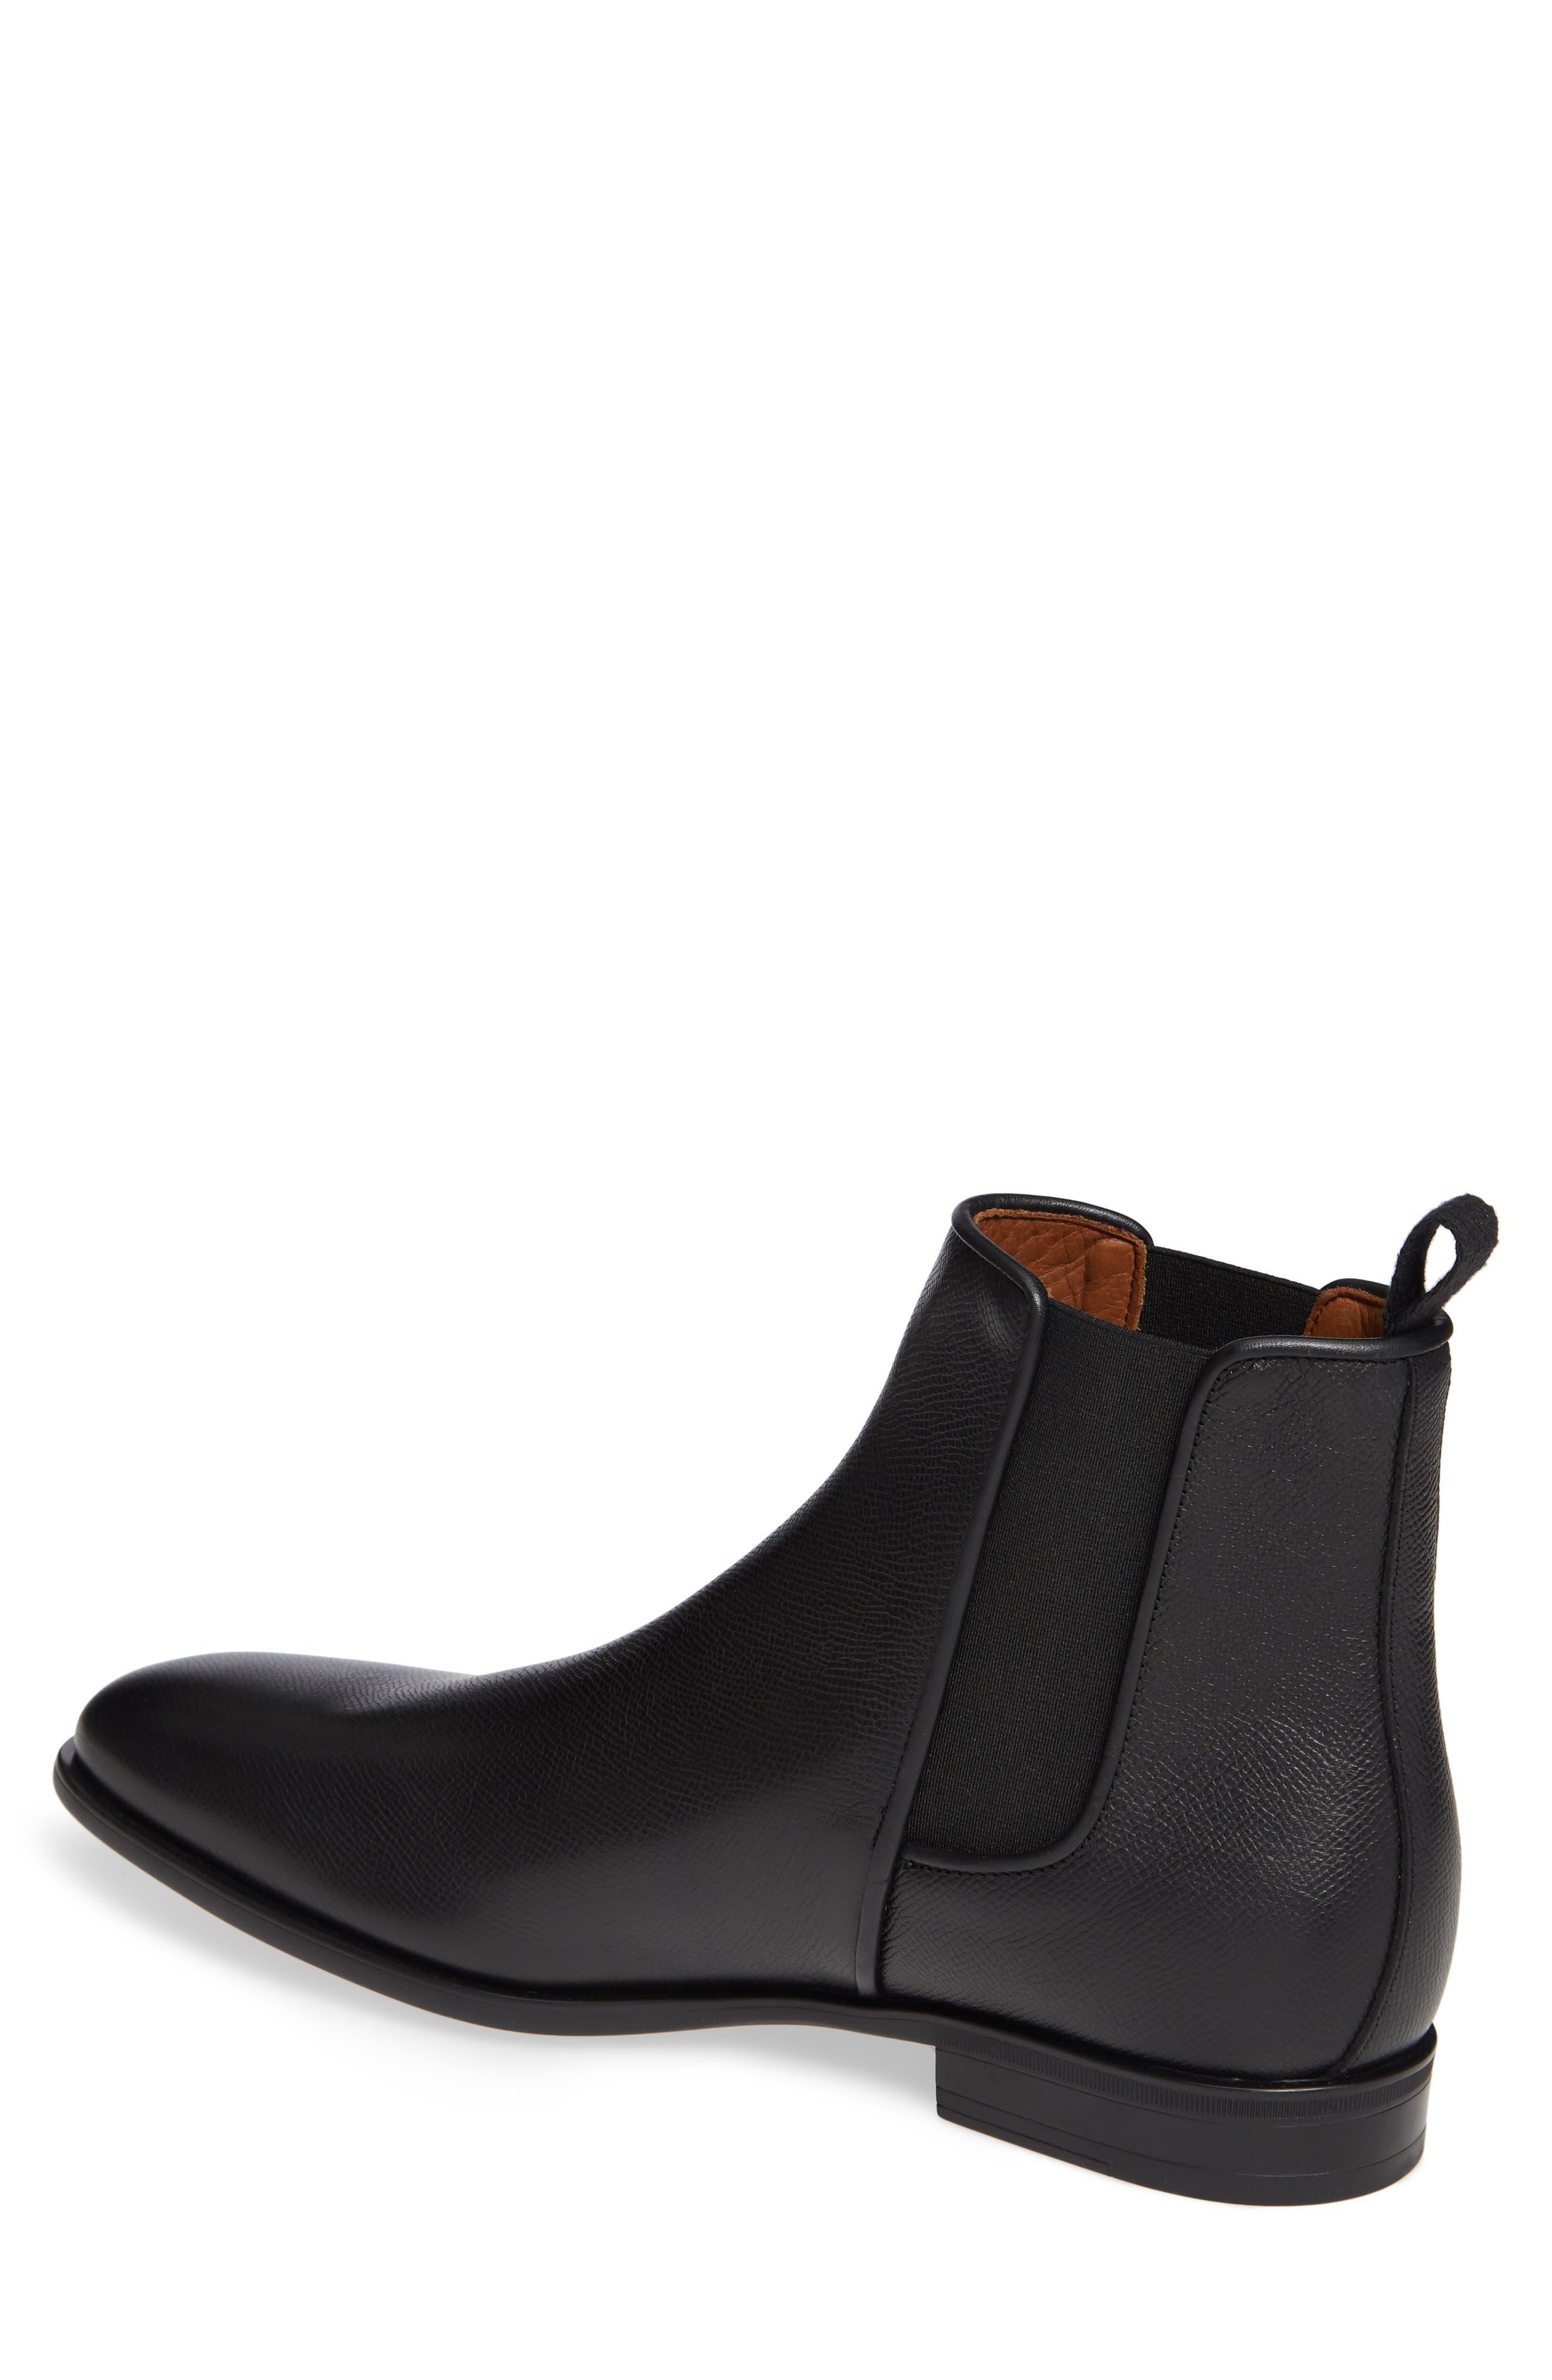 'Adrian' Weatherproof Chelsea Boot,                             Alternate thumbnail 2, color,                             003